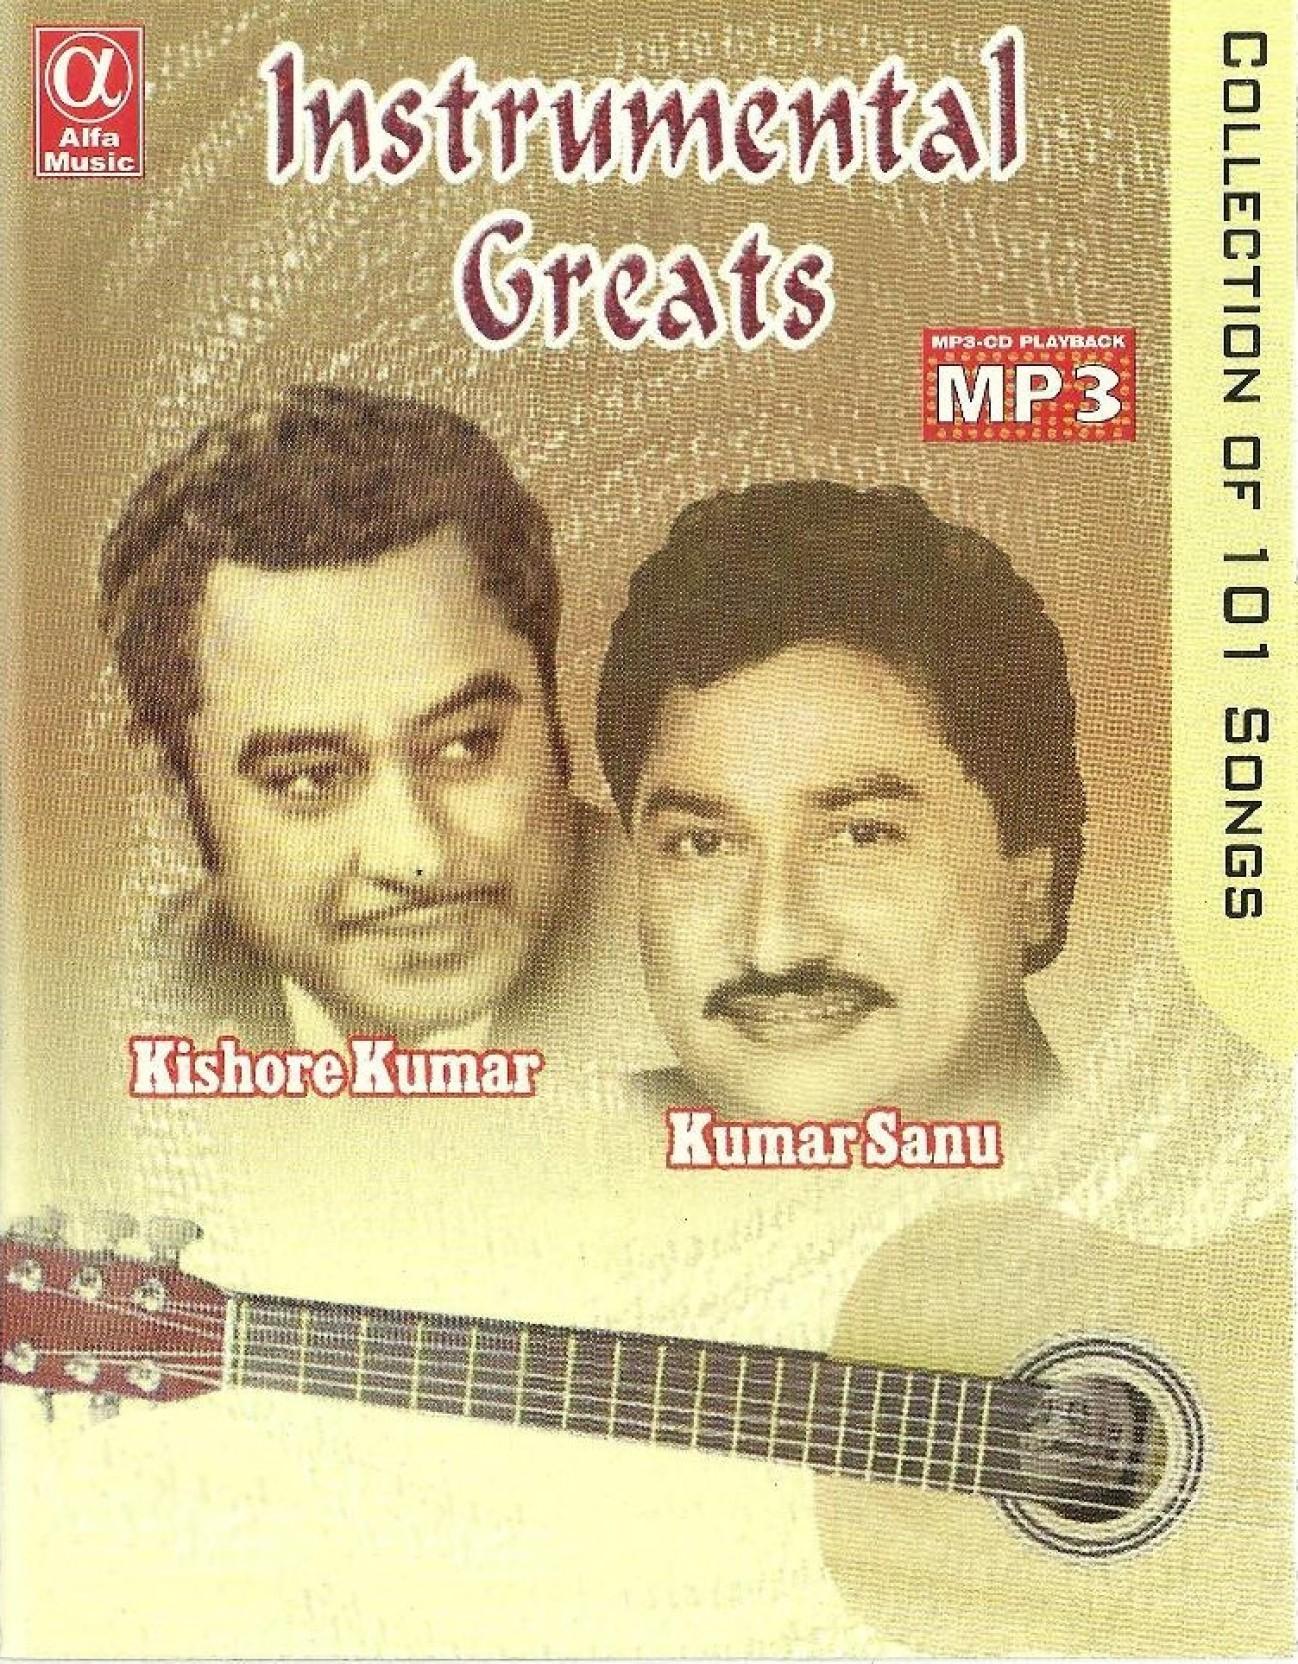 Instrumental Greats: Kishore Kumar/Kumar Sanu Music MP3